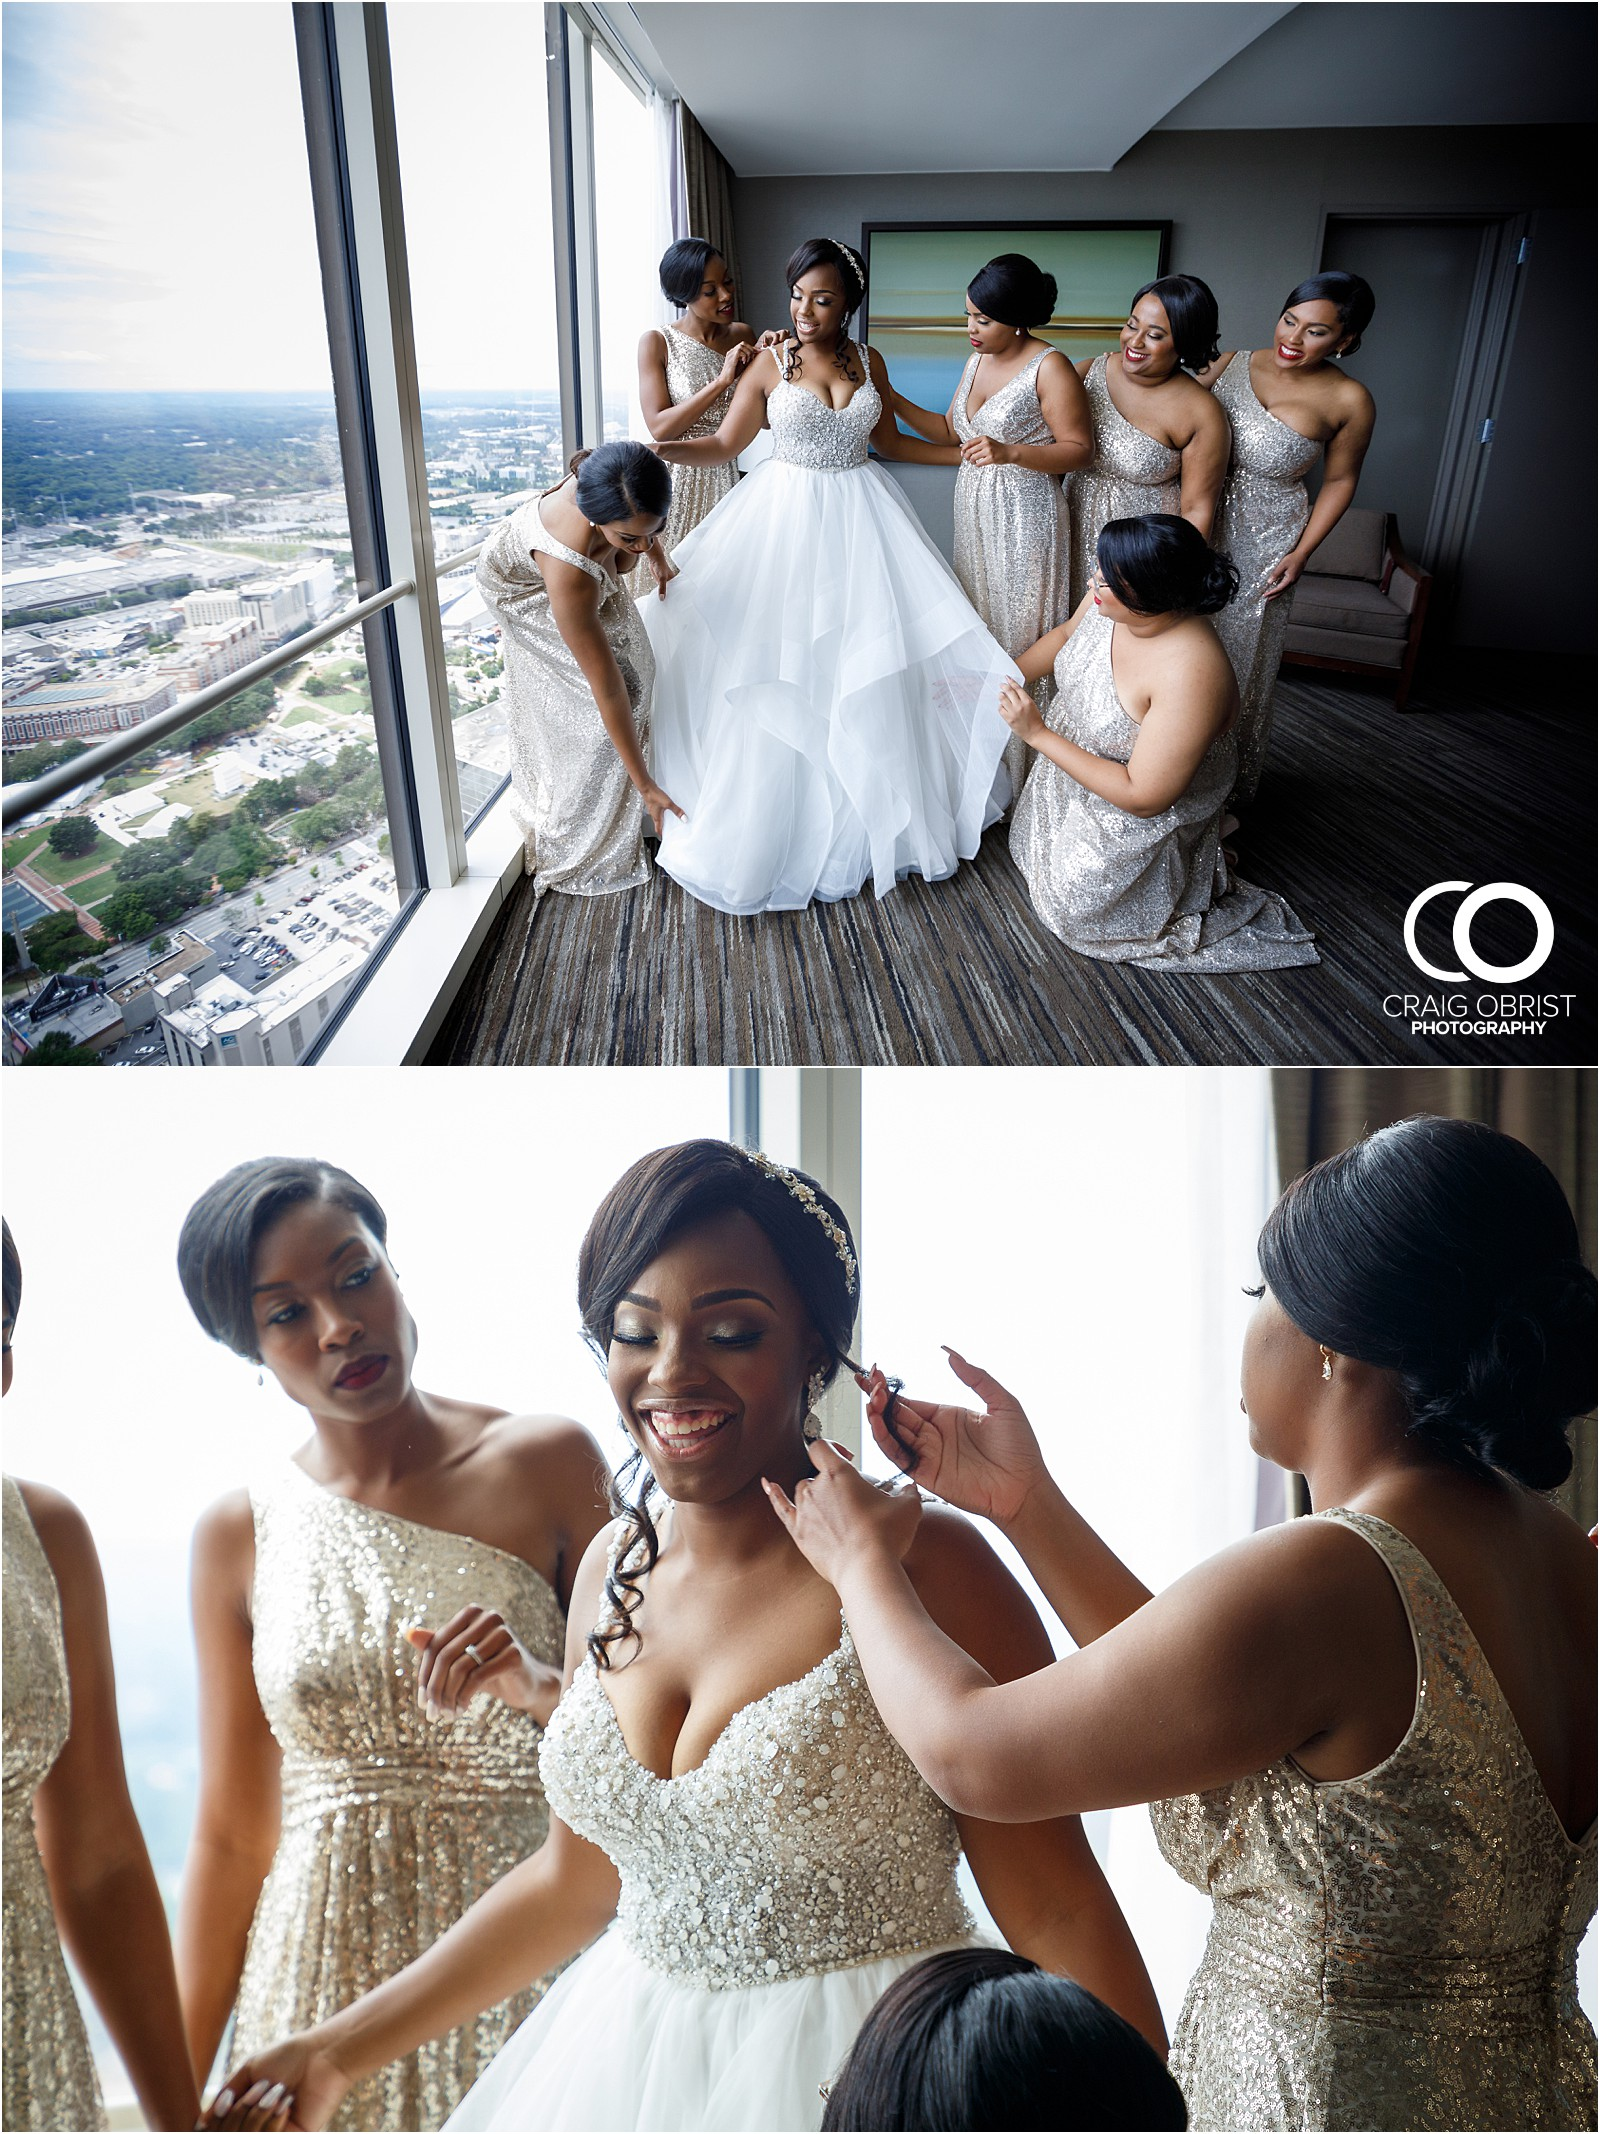 200 peachtree southern exchange wedding portraits atlanta skyline_0019.jpg